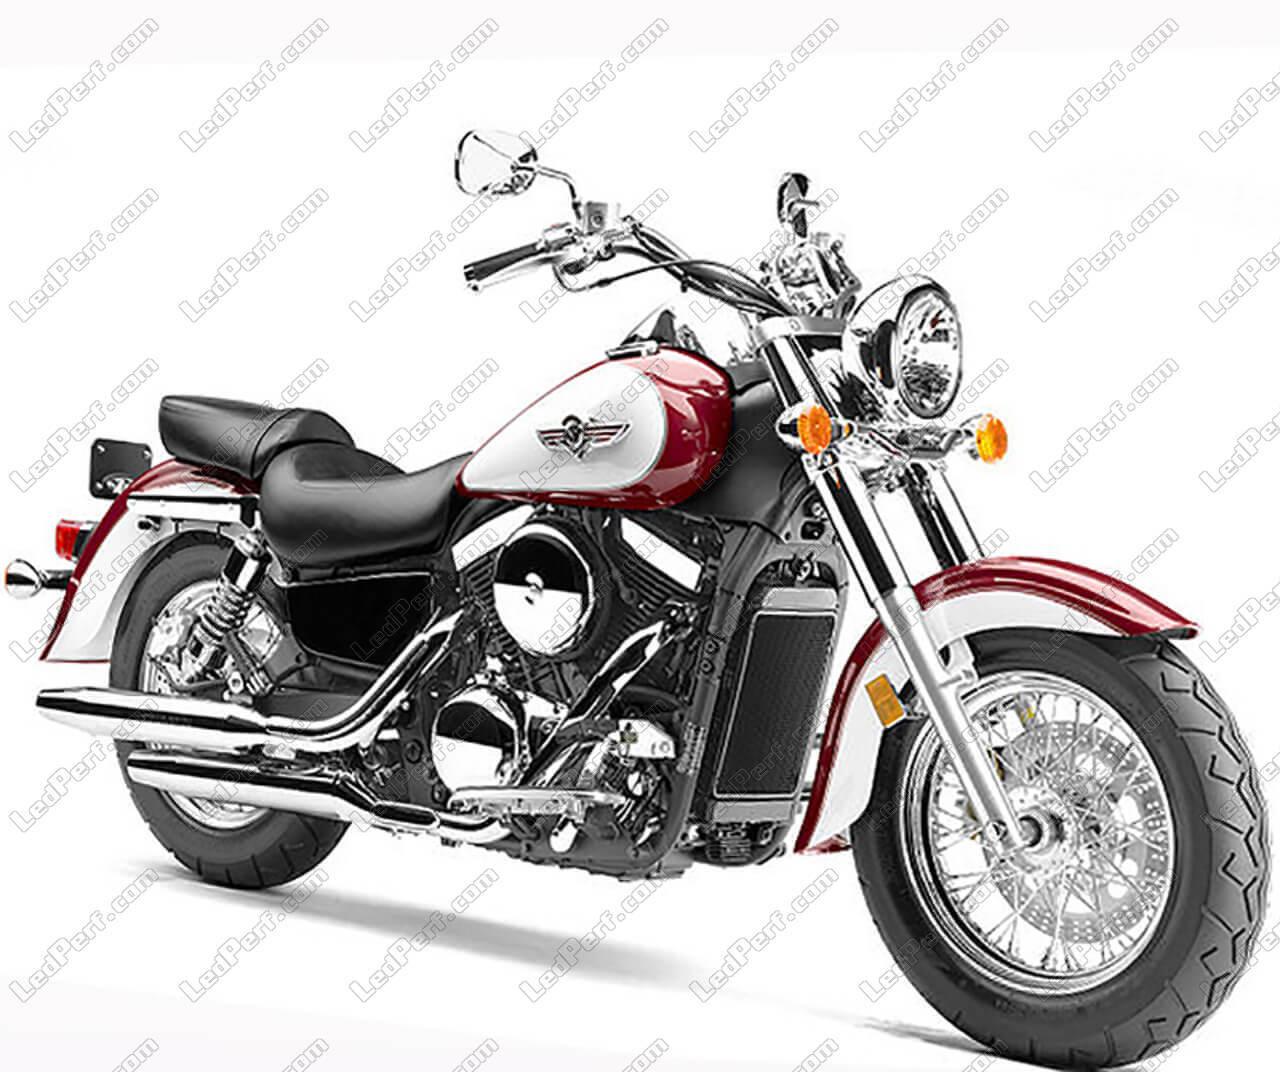 additional led headlights for motorcycle kawasaki vn 1500. Black Bedroom Furniture Sets. Home Design Ideas